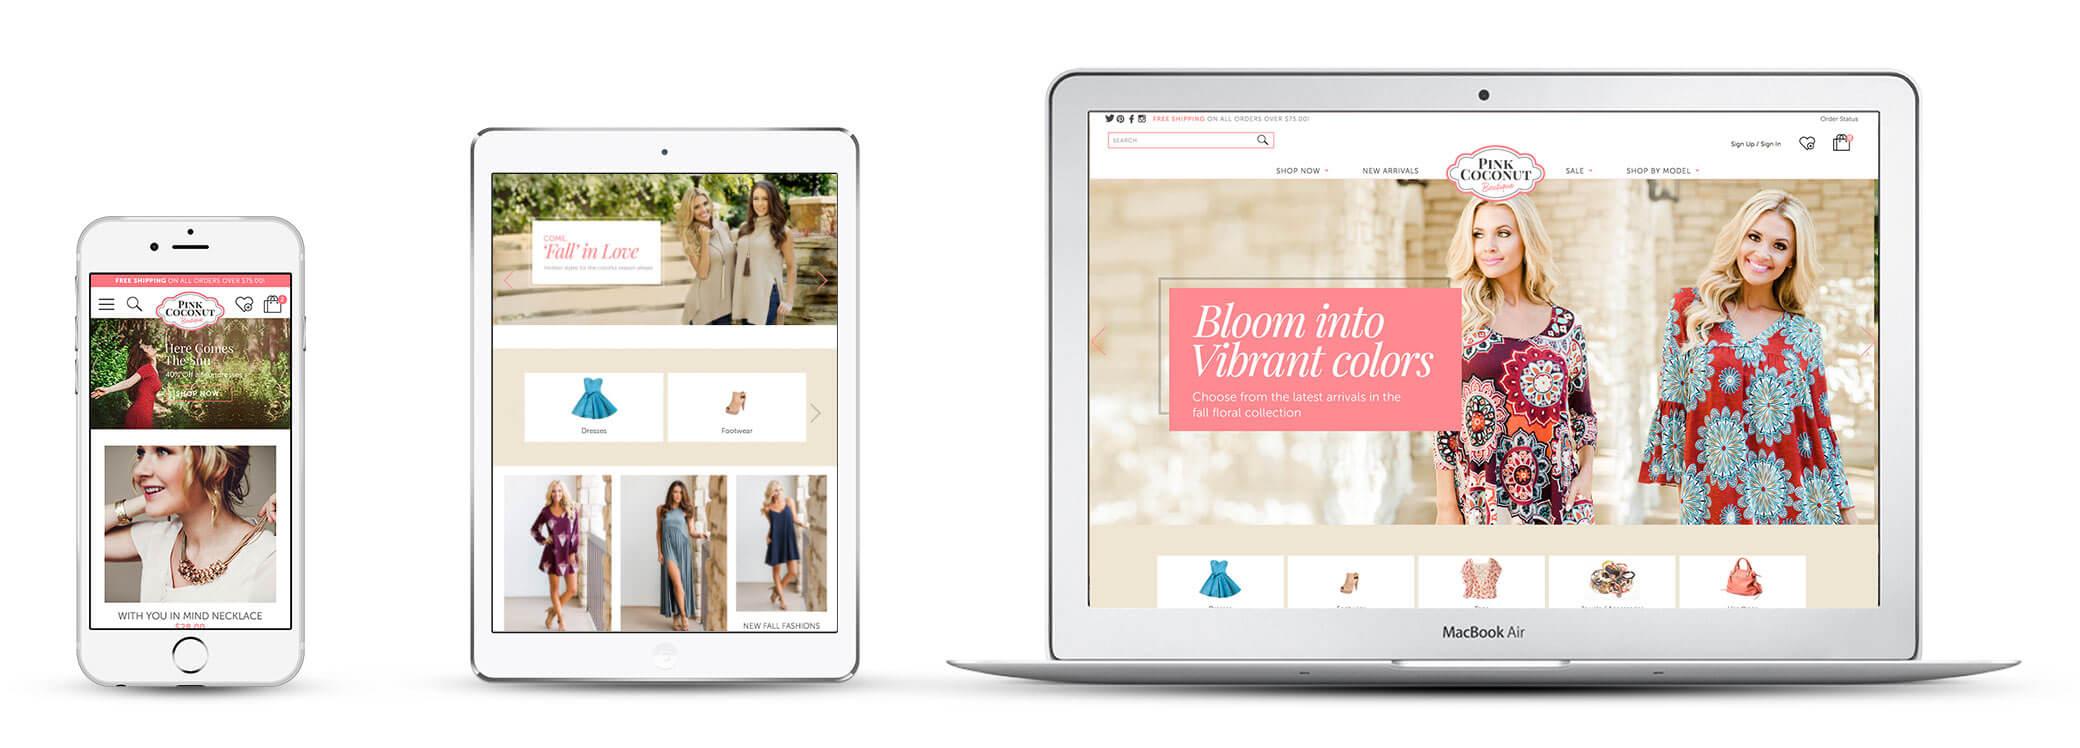 Echidna Pink Coconut Boutique Website Design Across Devices